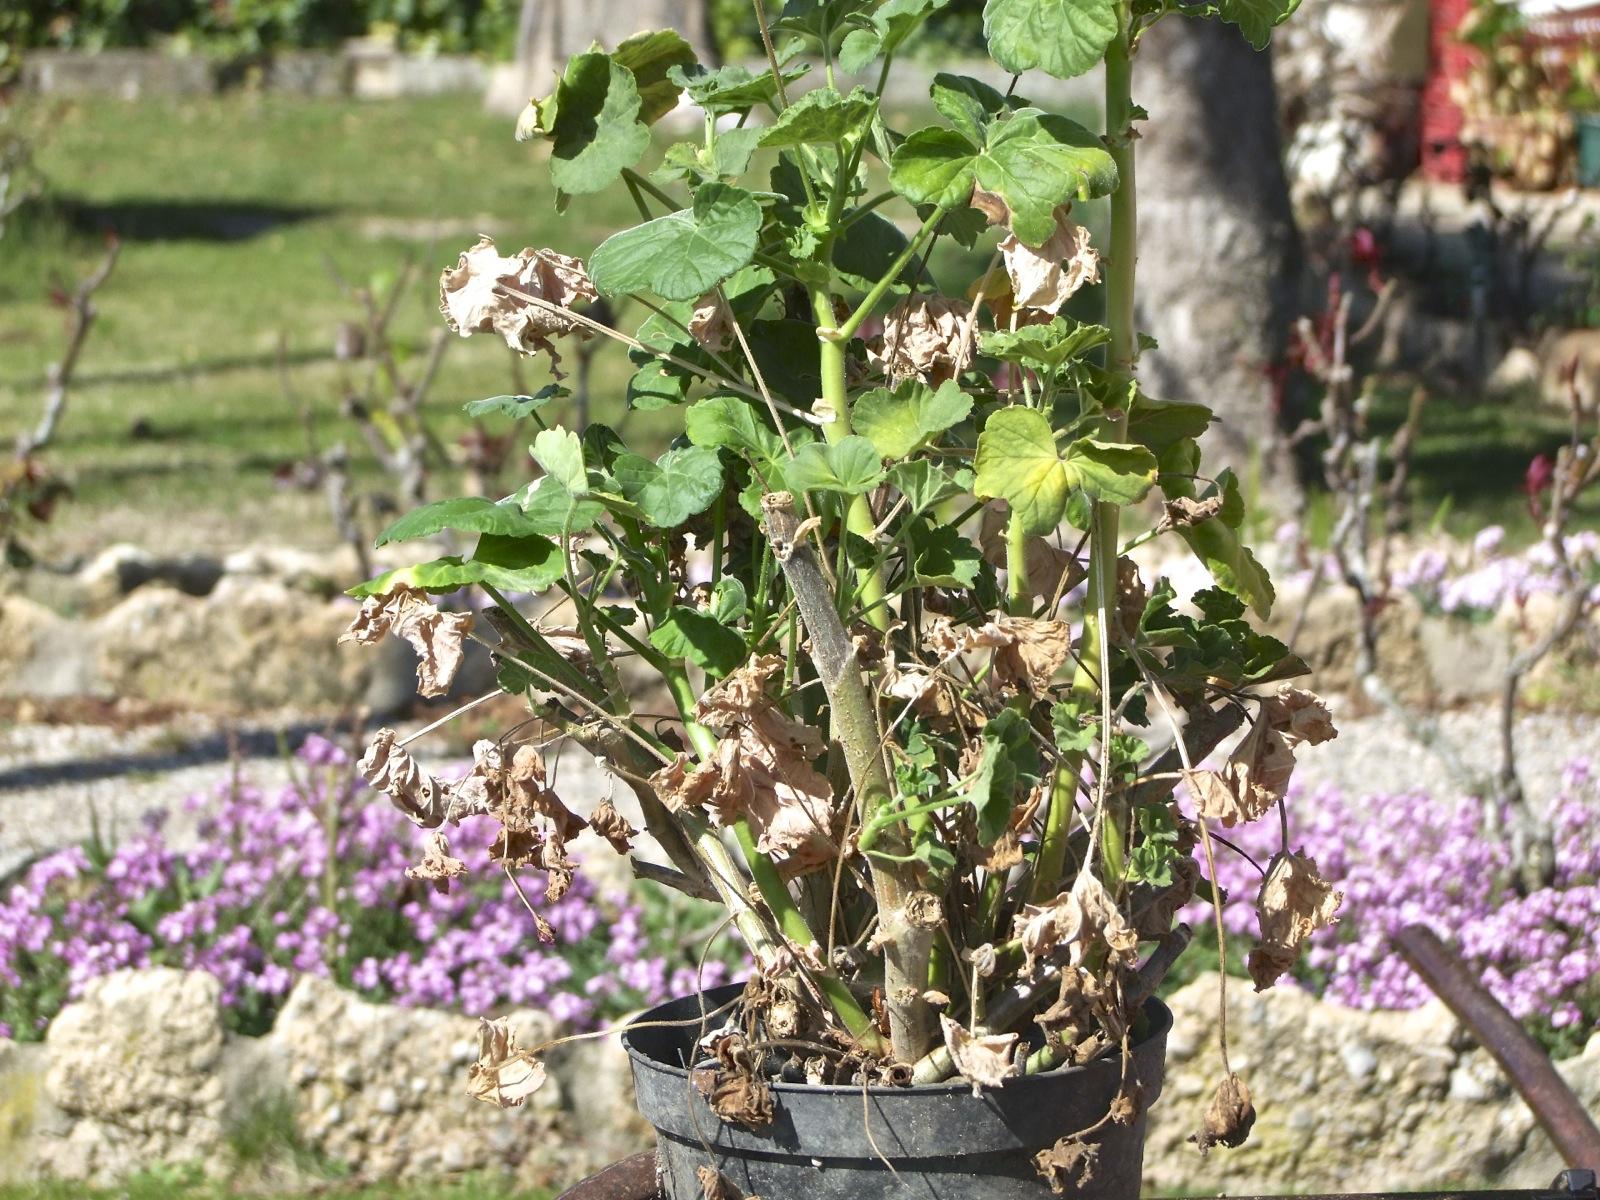 Poda de geranios el huerto familiar - Poda de hortensias en maceta ...